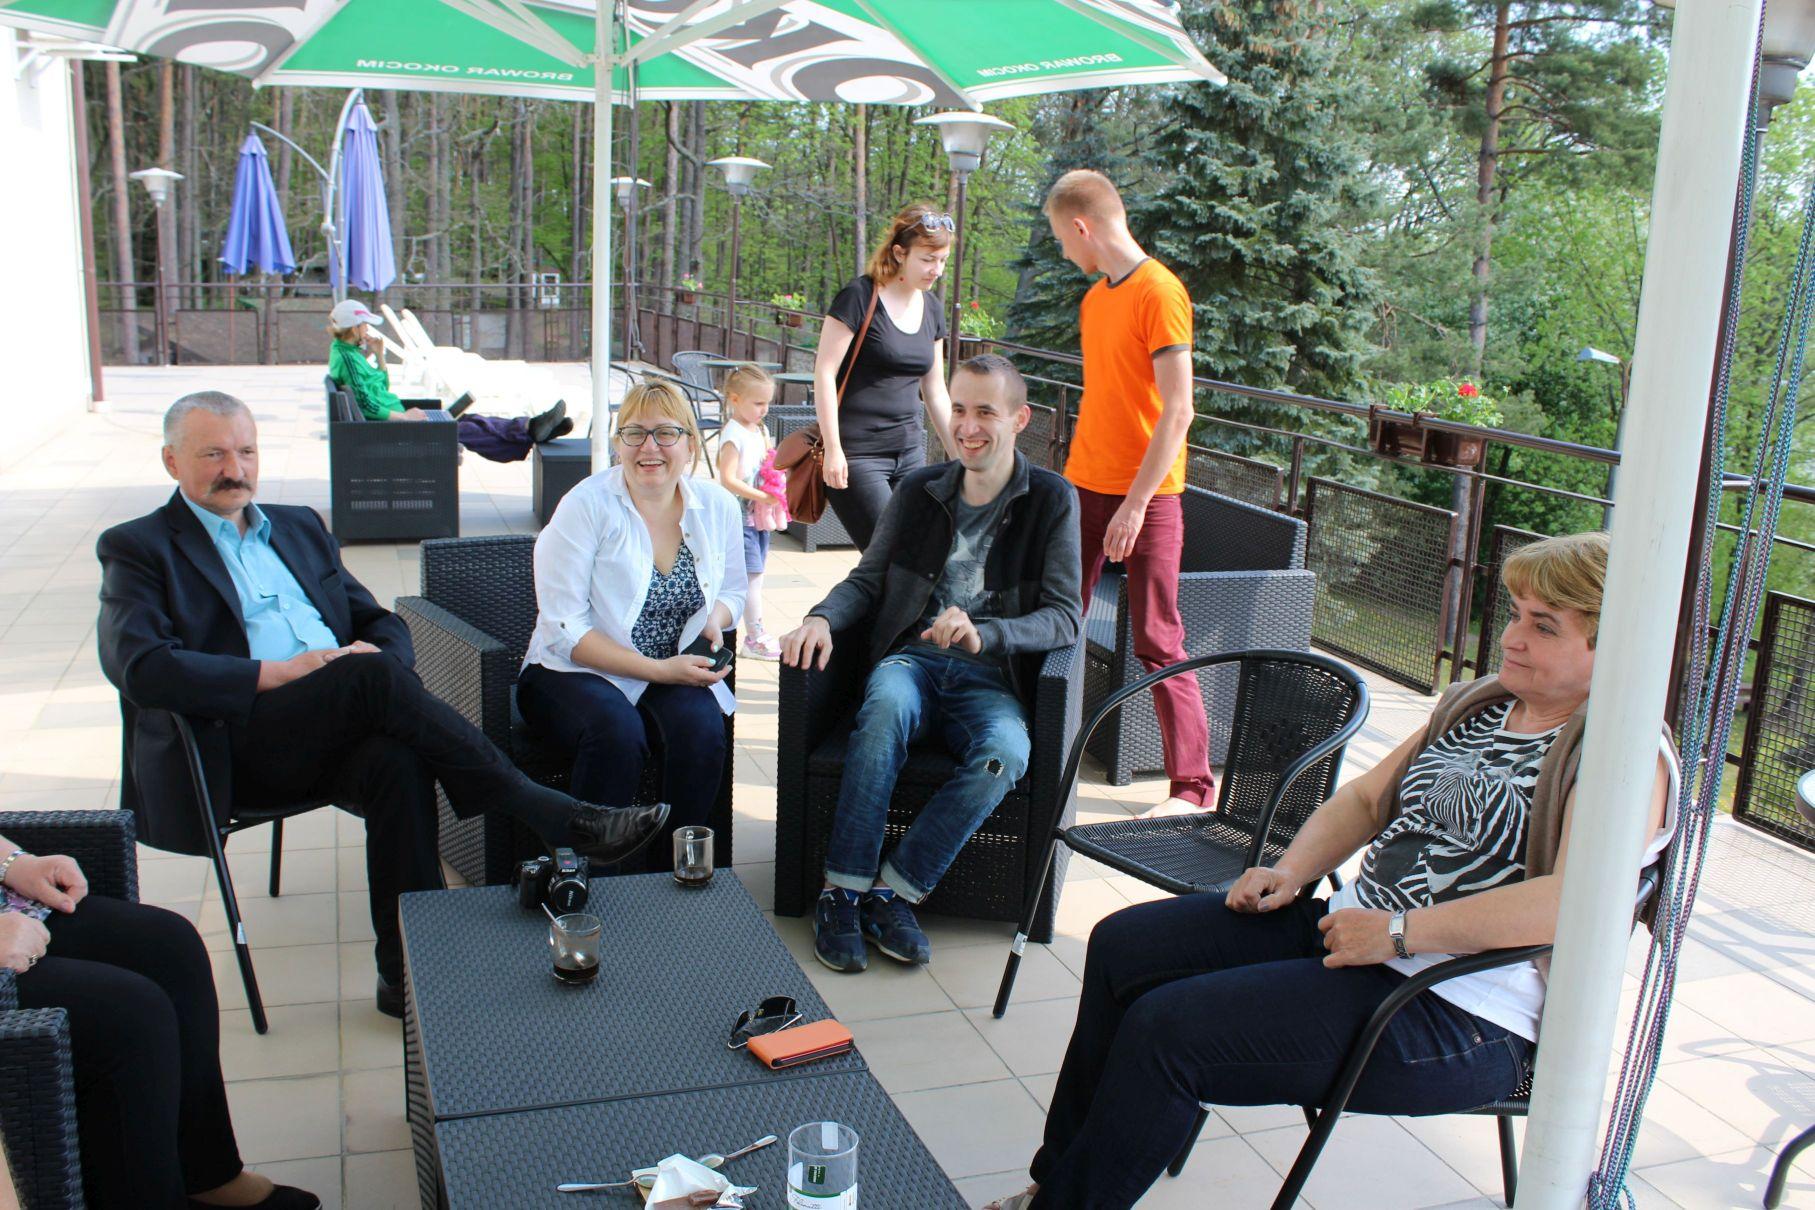 2016-05-07 Kamionka - Wiska Garncarska (116)